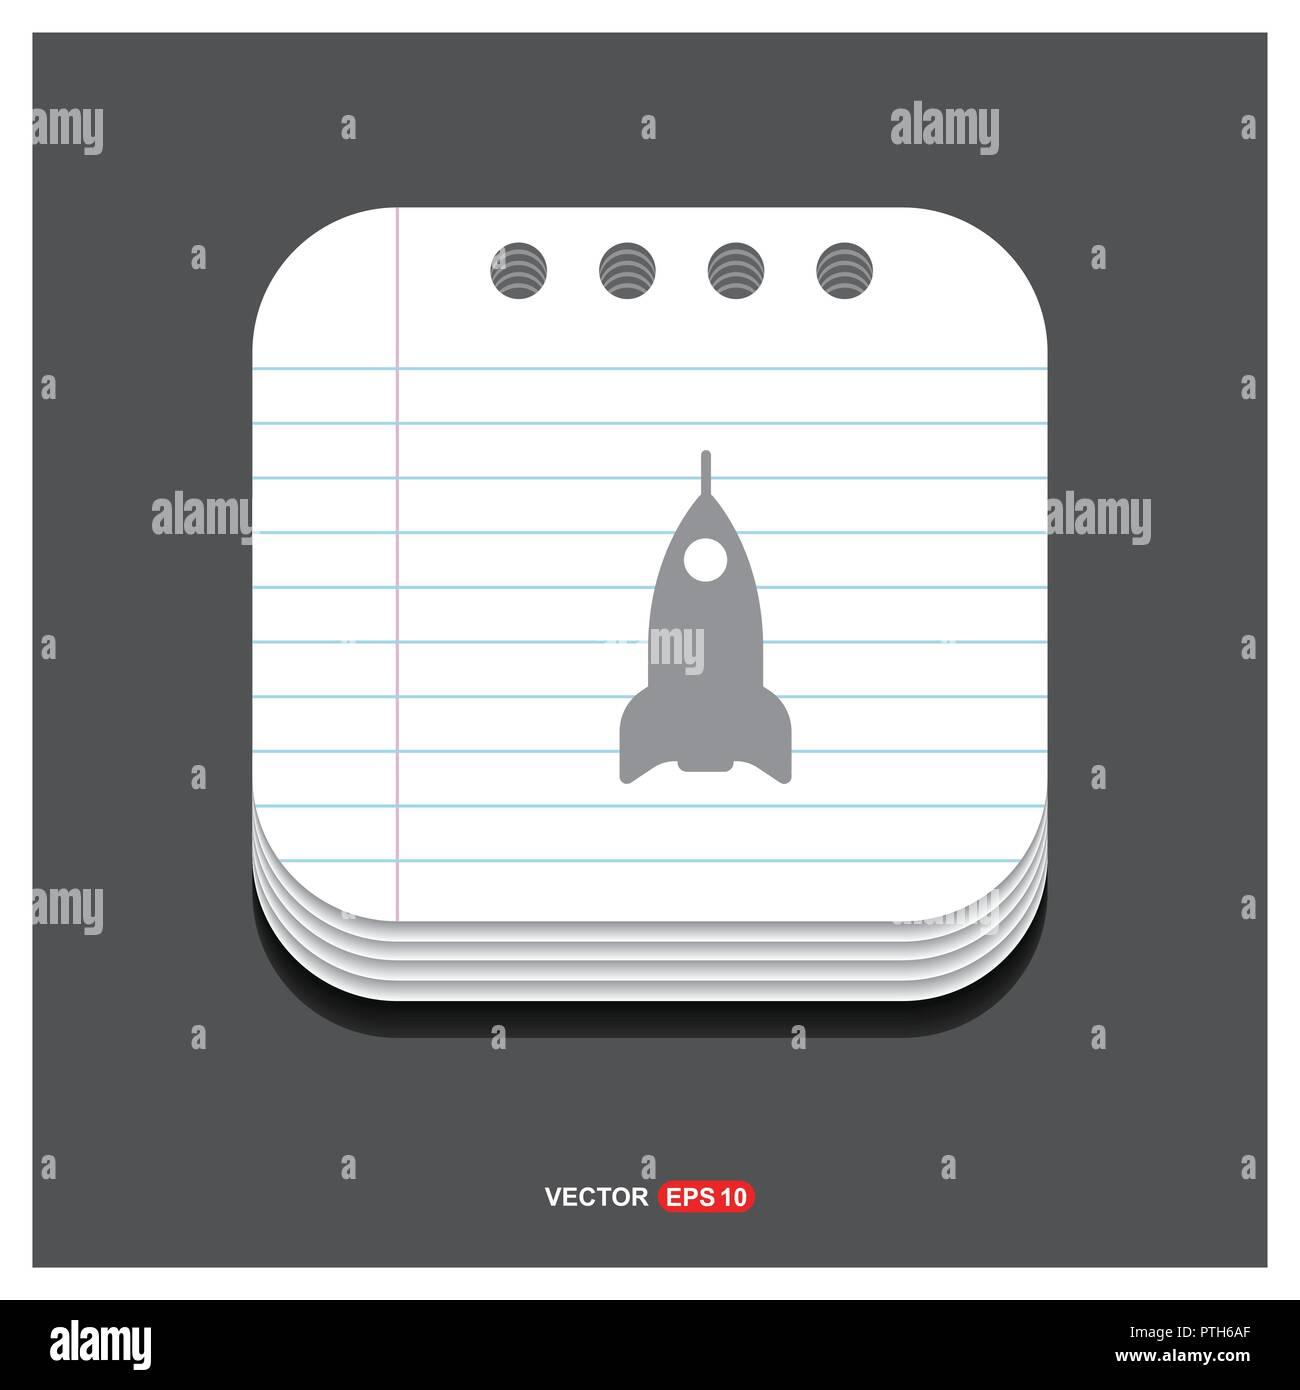 Airplane Icon Free Vector Icon Stock Vector Art Illustration